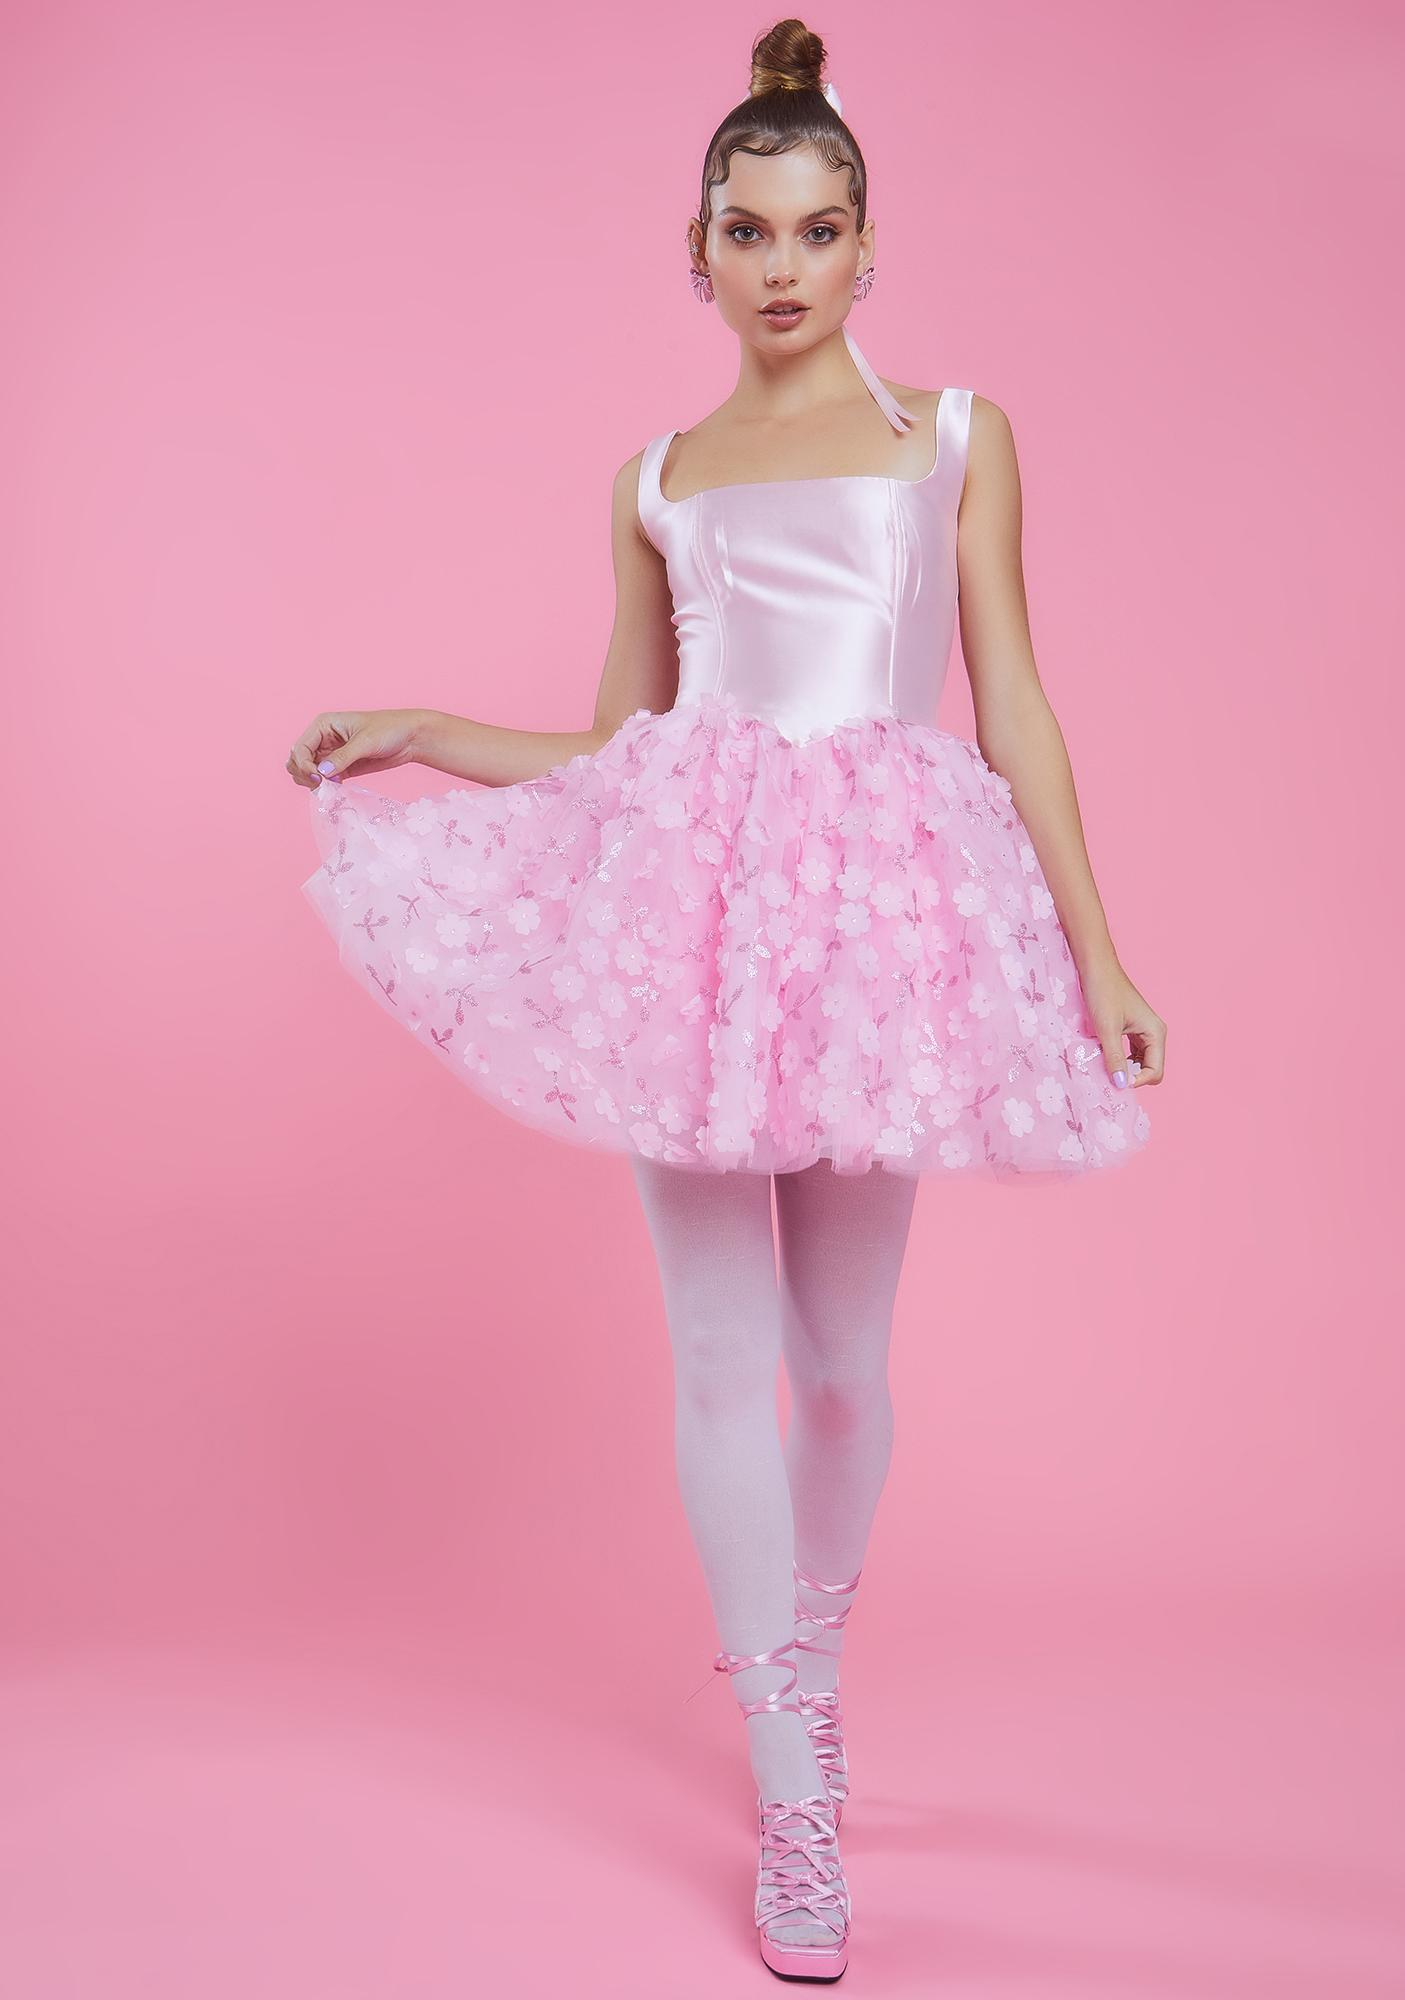 Sugar Thrillz So On Pointe Flower Tutu Dress